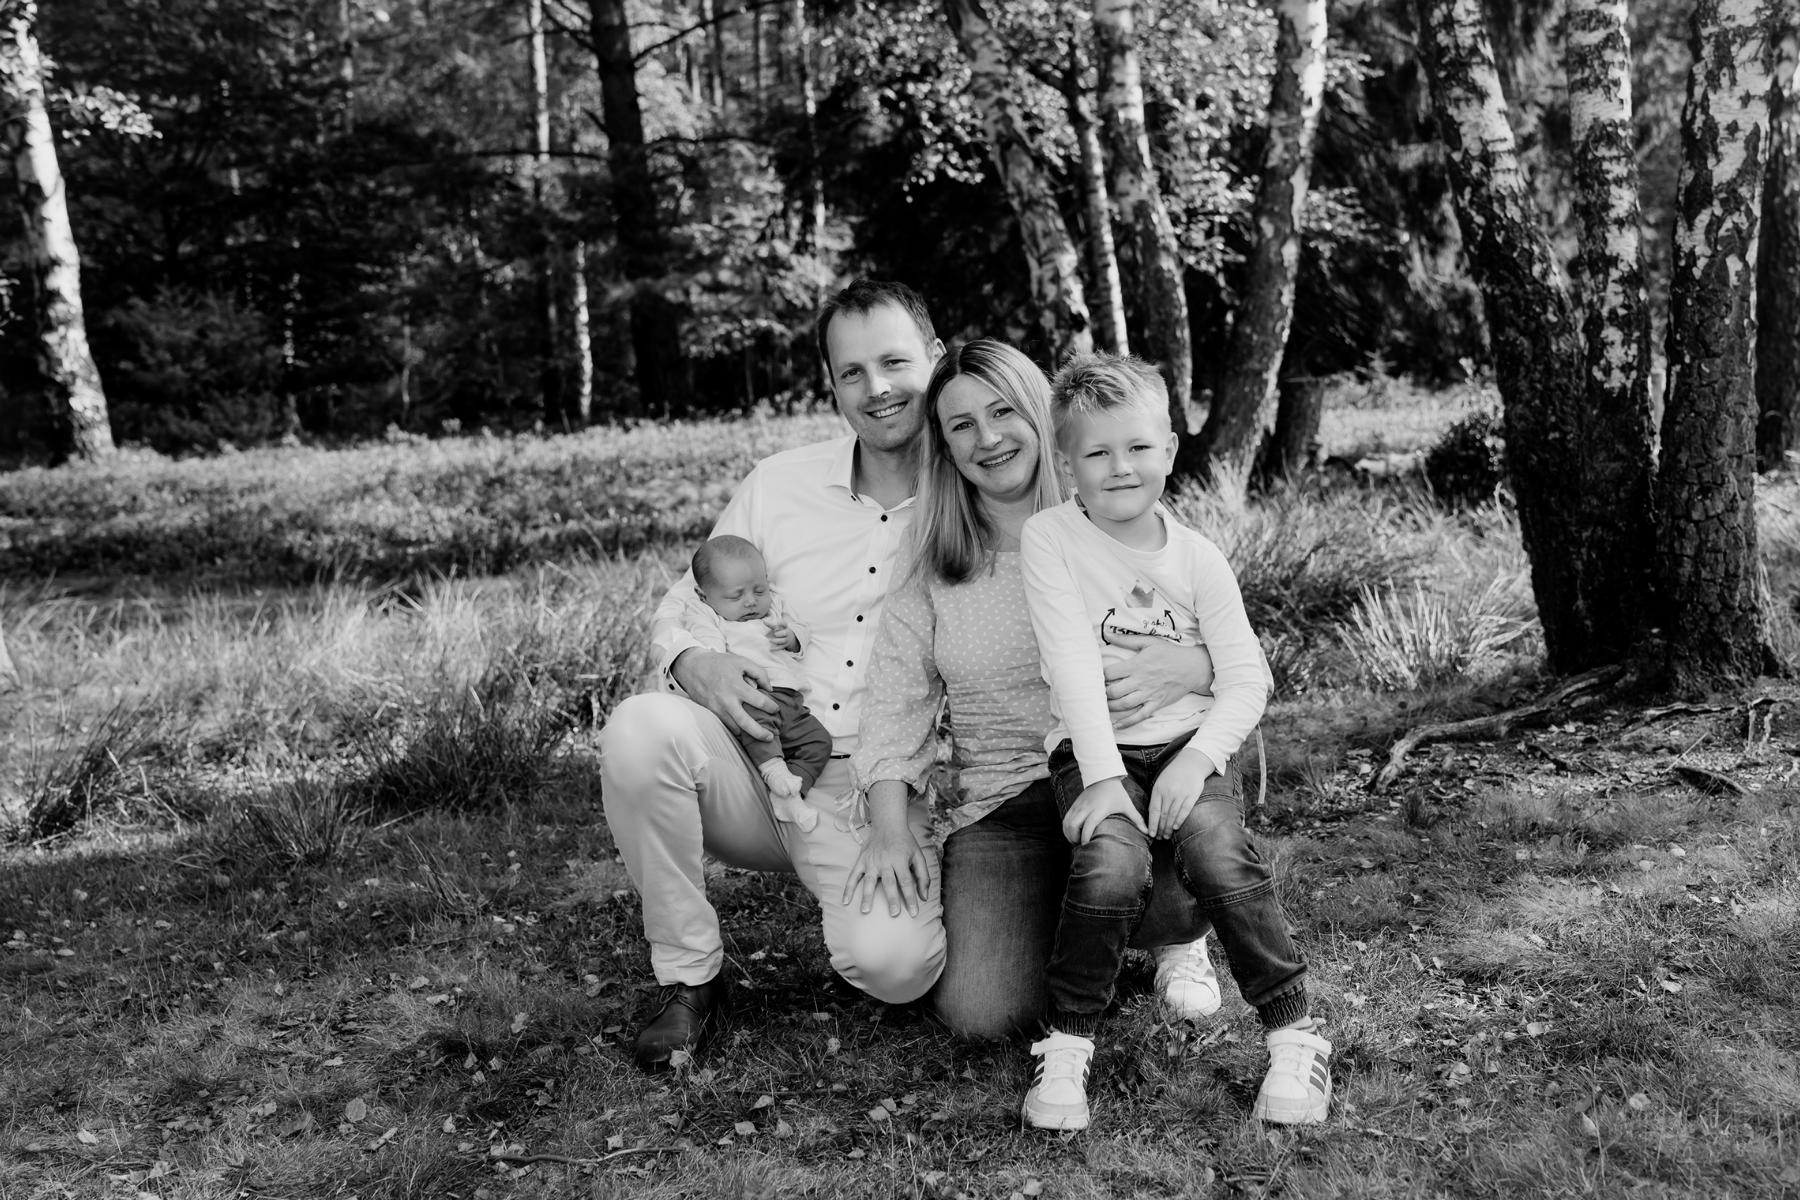 Familienshooting Handeloh, Babyshooting Tostedt, Familienfotograf Schneverdingen, Familie Fotoshooting Sittensen, Familienbilder Tostedt, Kinderfotos Lauenbrück